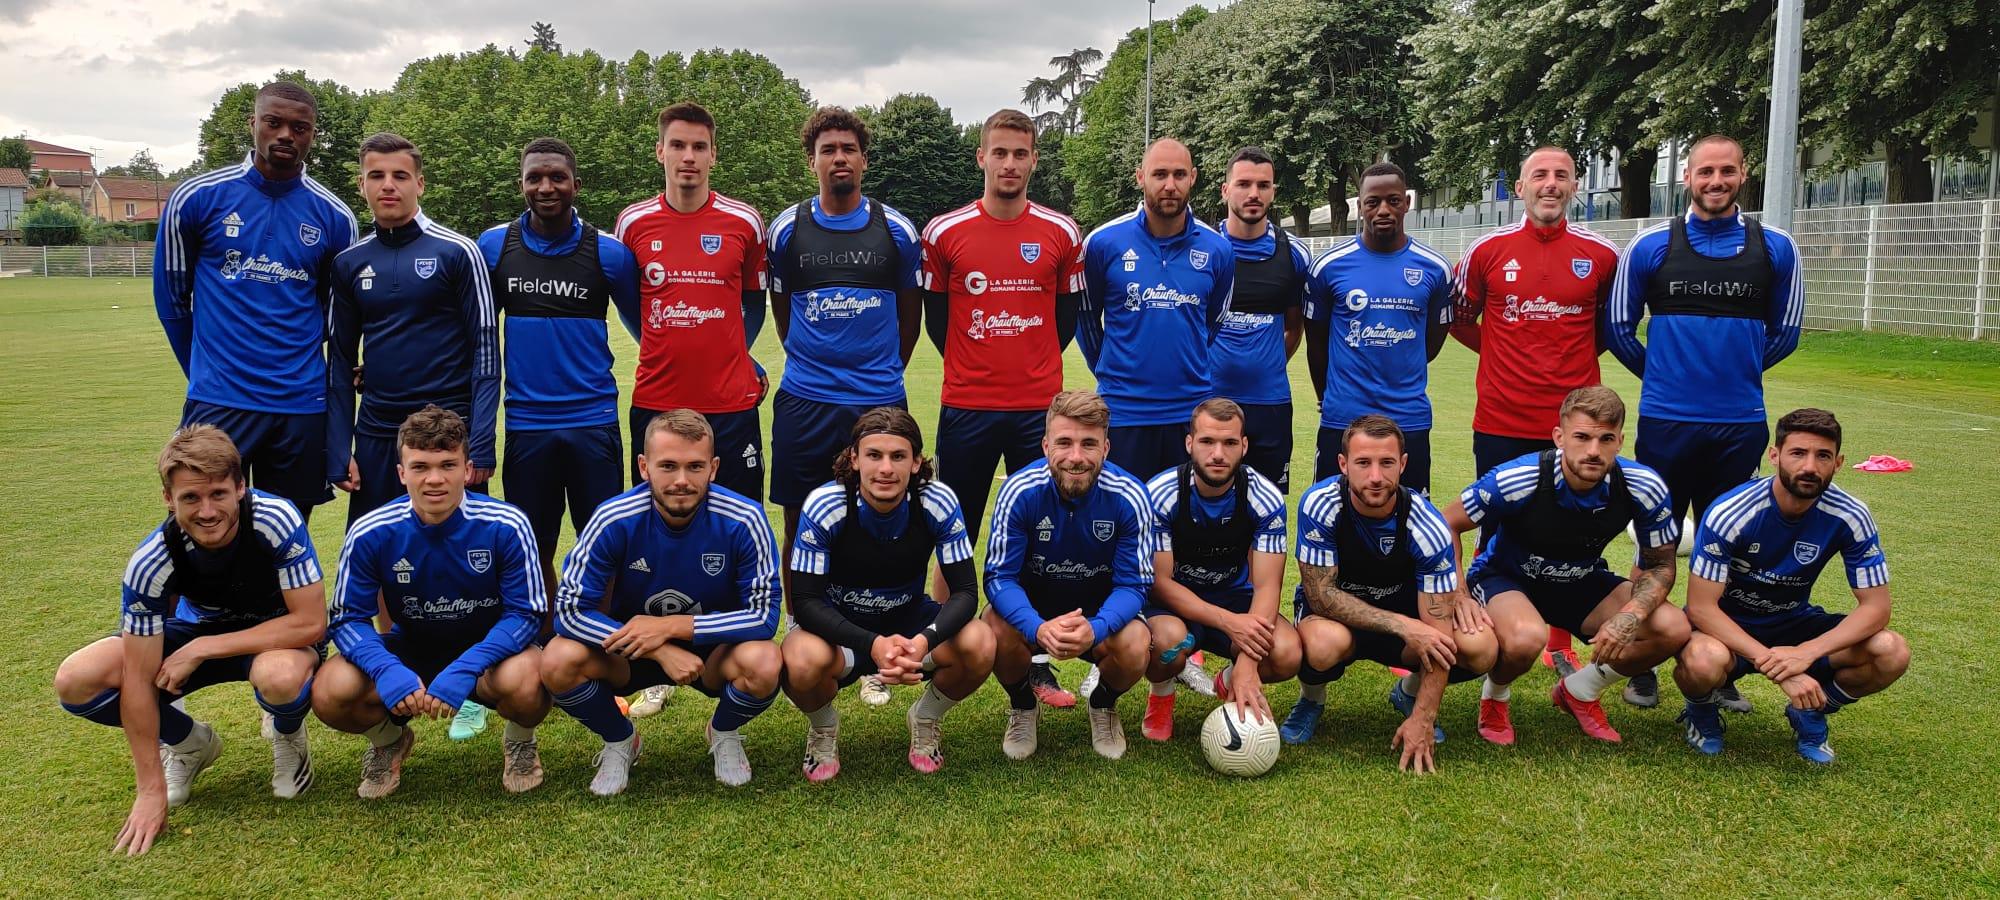 FCVB - Football Club Villefranche Beaujolais